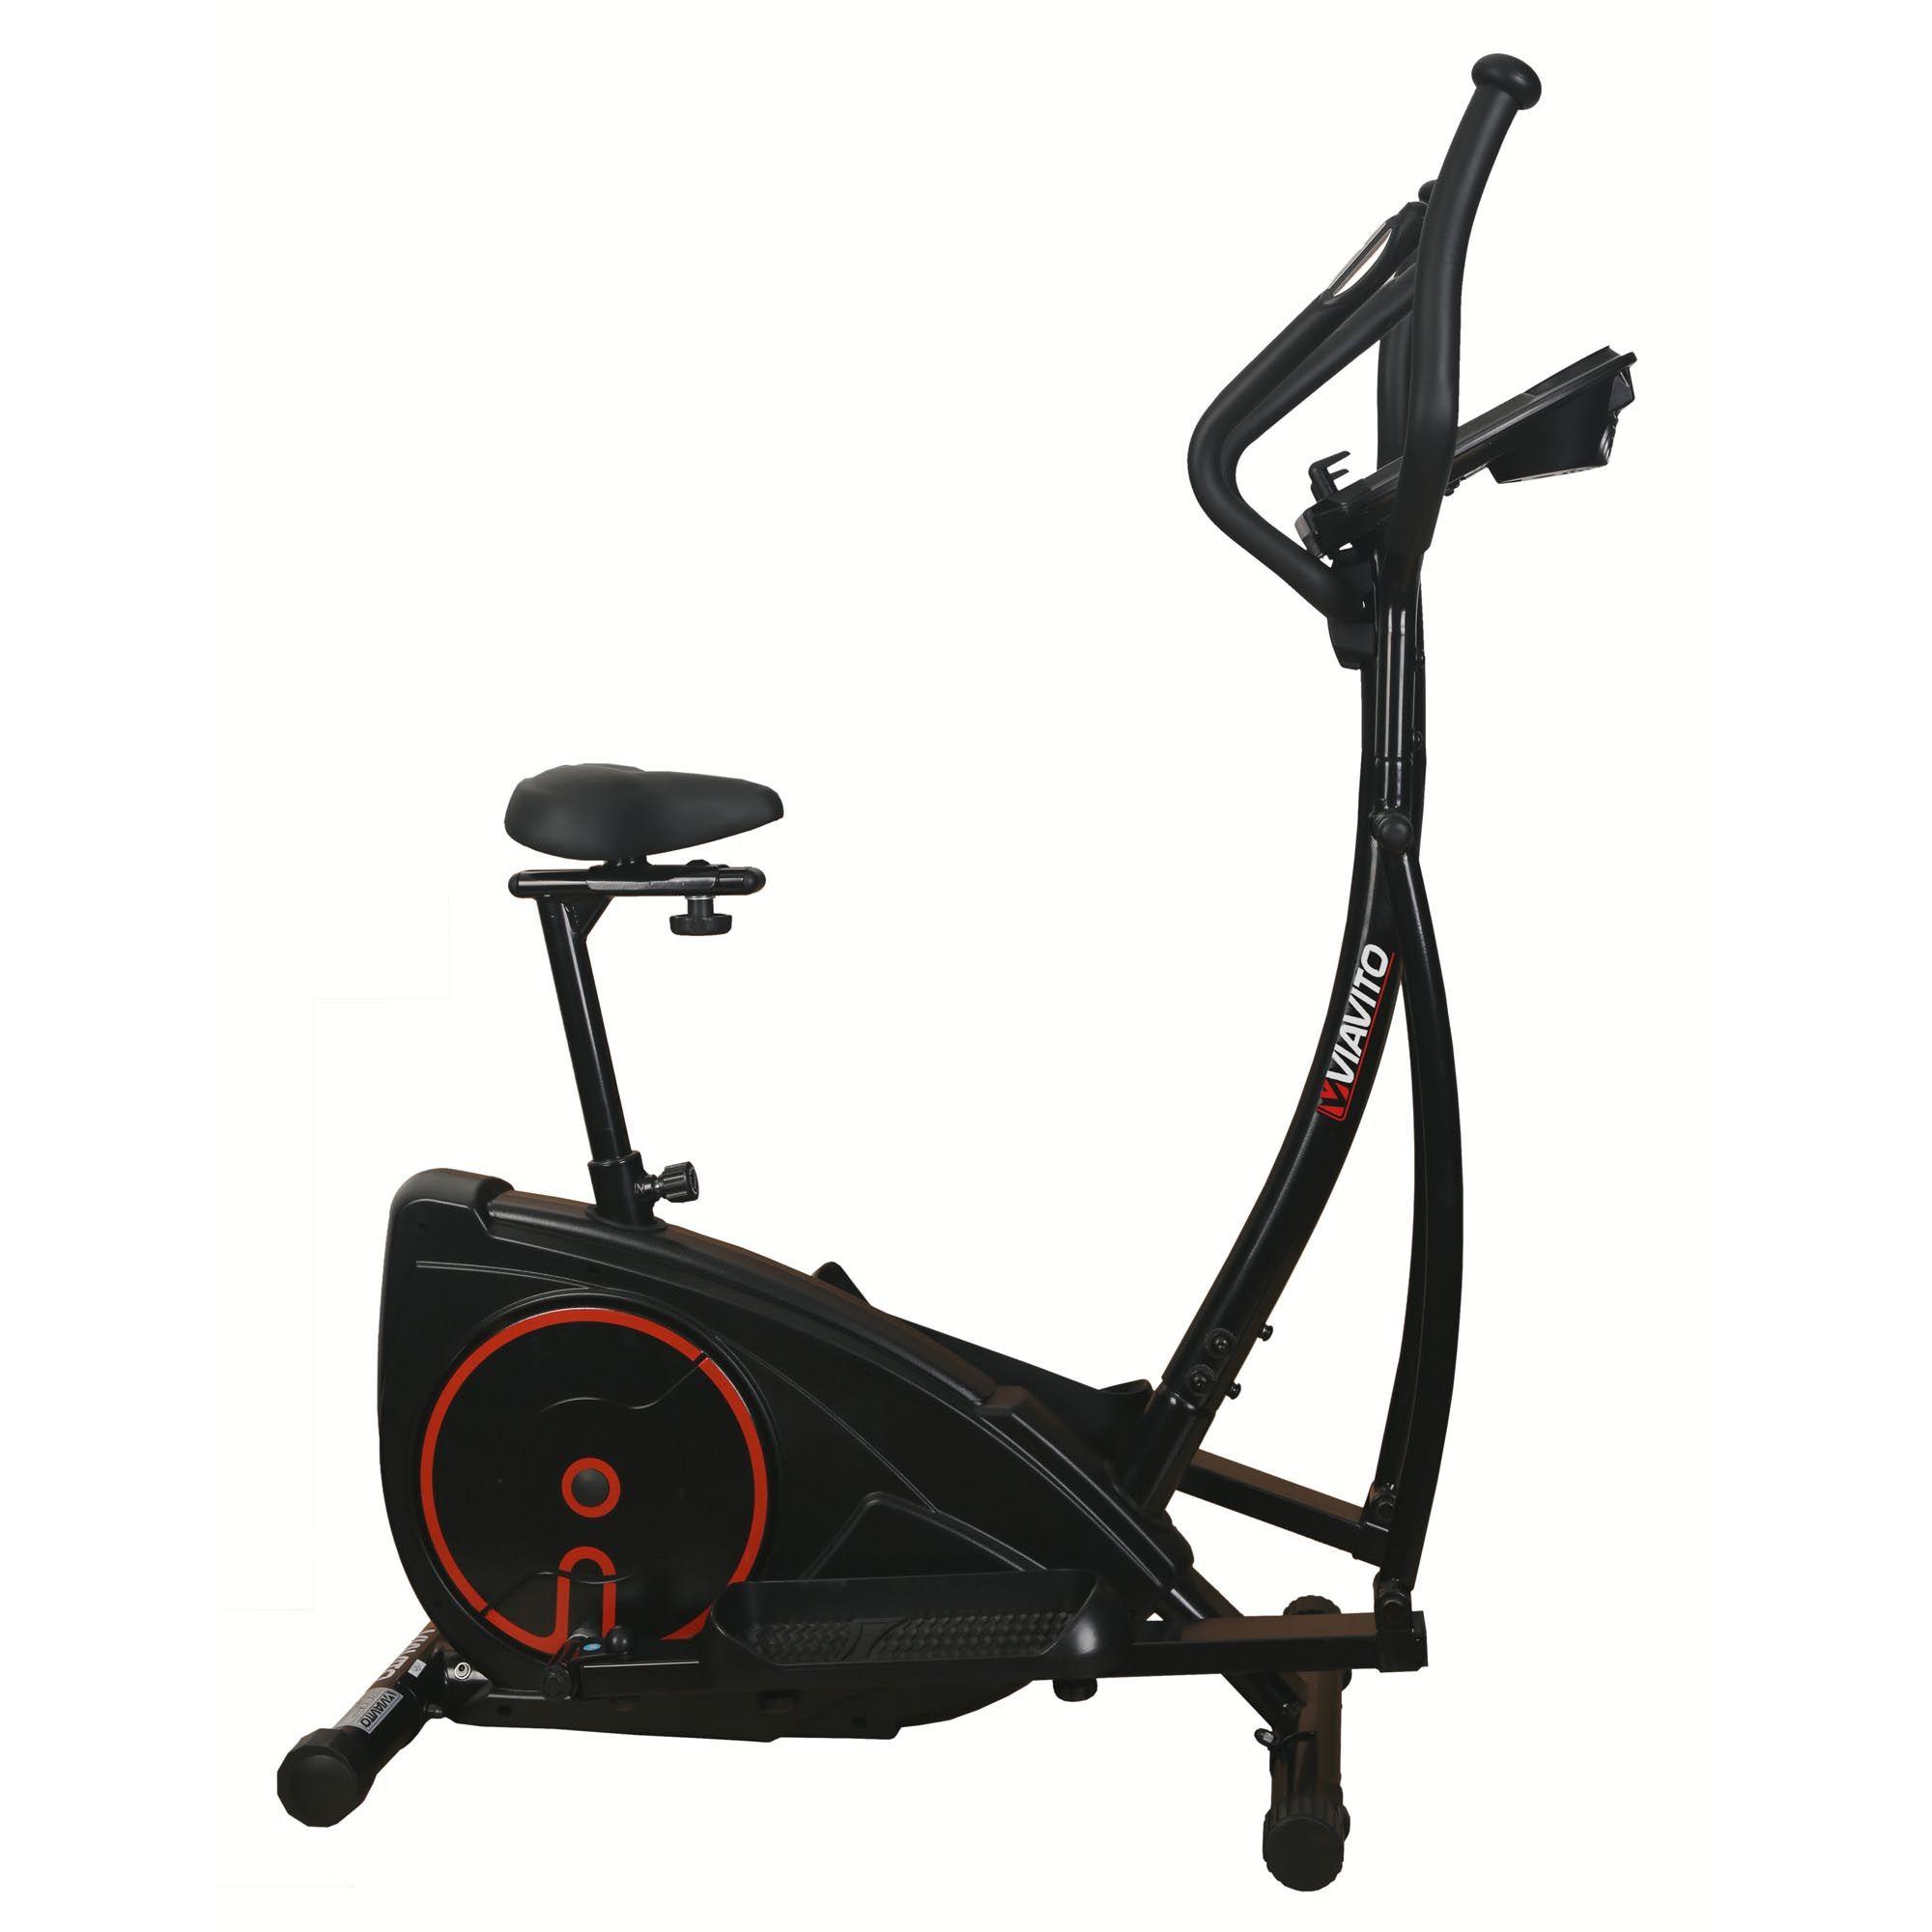 Viavito Setry 2 In 1 Elliptical Trainer Amp Exercise Bike